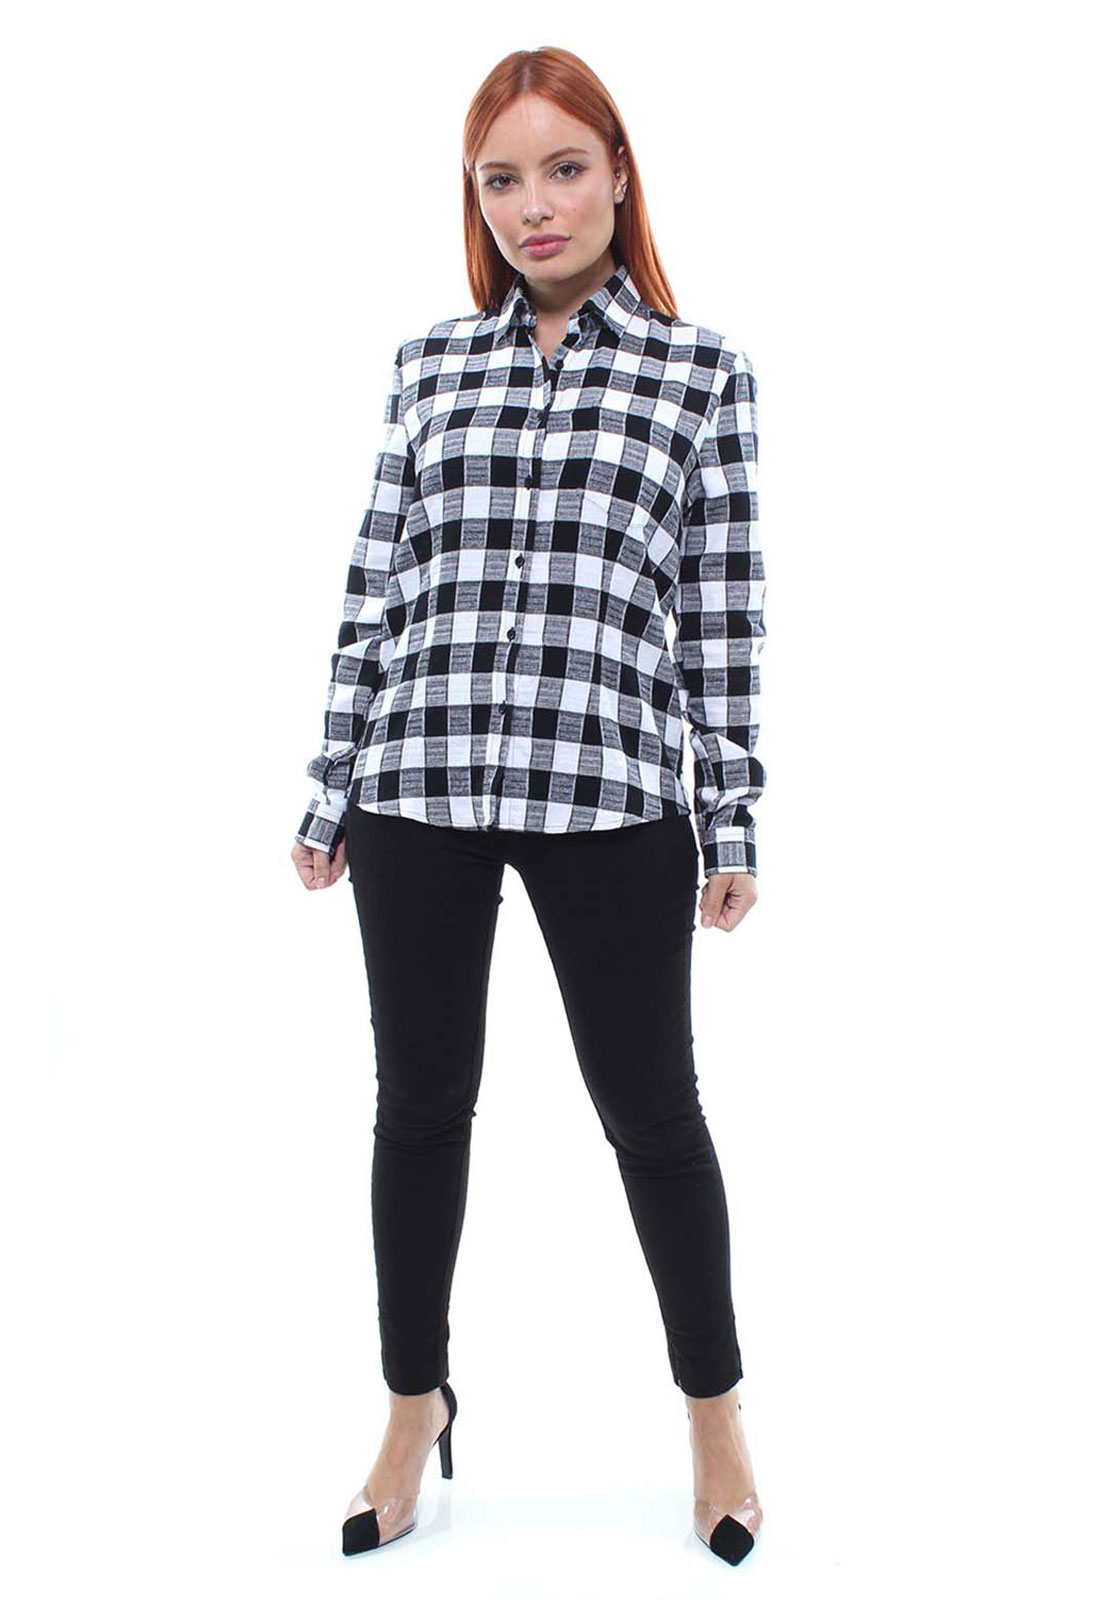 Camisa Feminina Xadrez Flanelada Crocker - 47391  - CROCKER JEANS